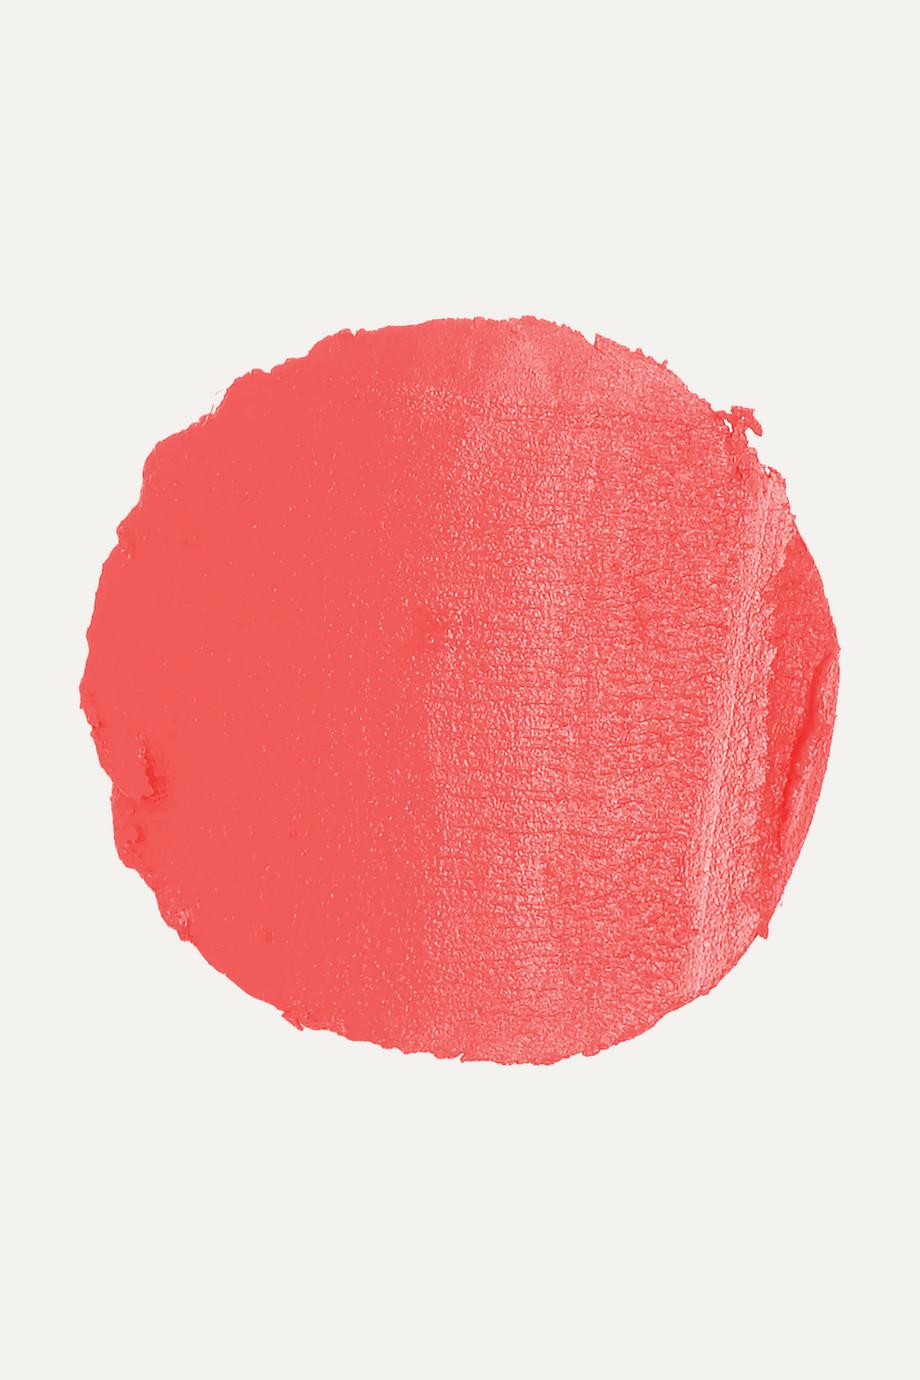 NARS Audacious Lipstick - Juliette